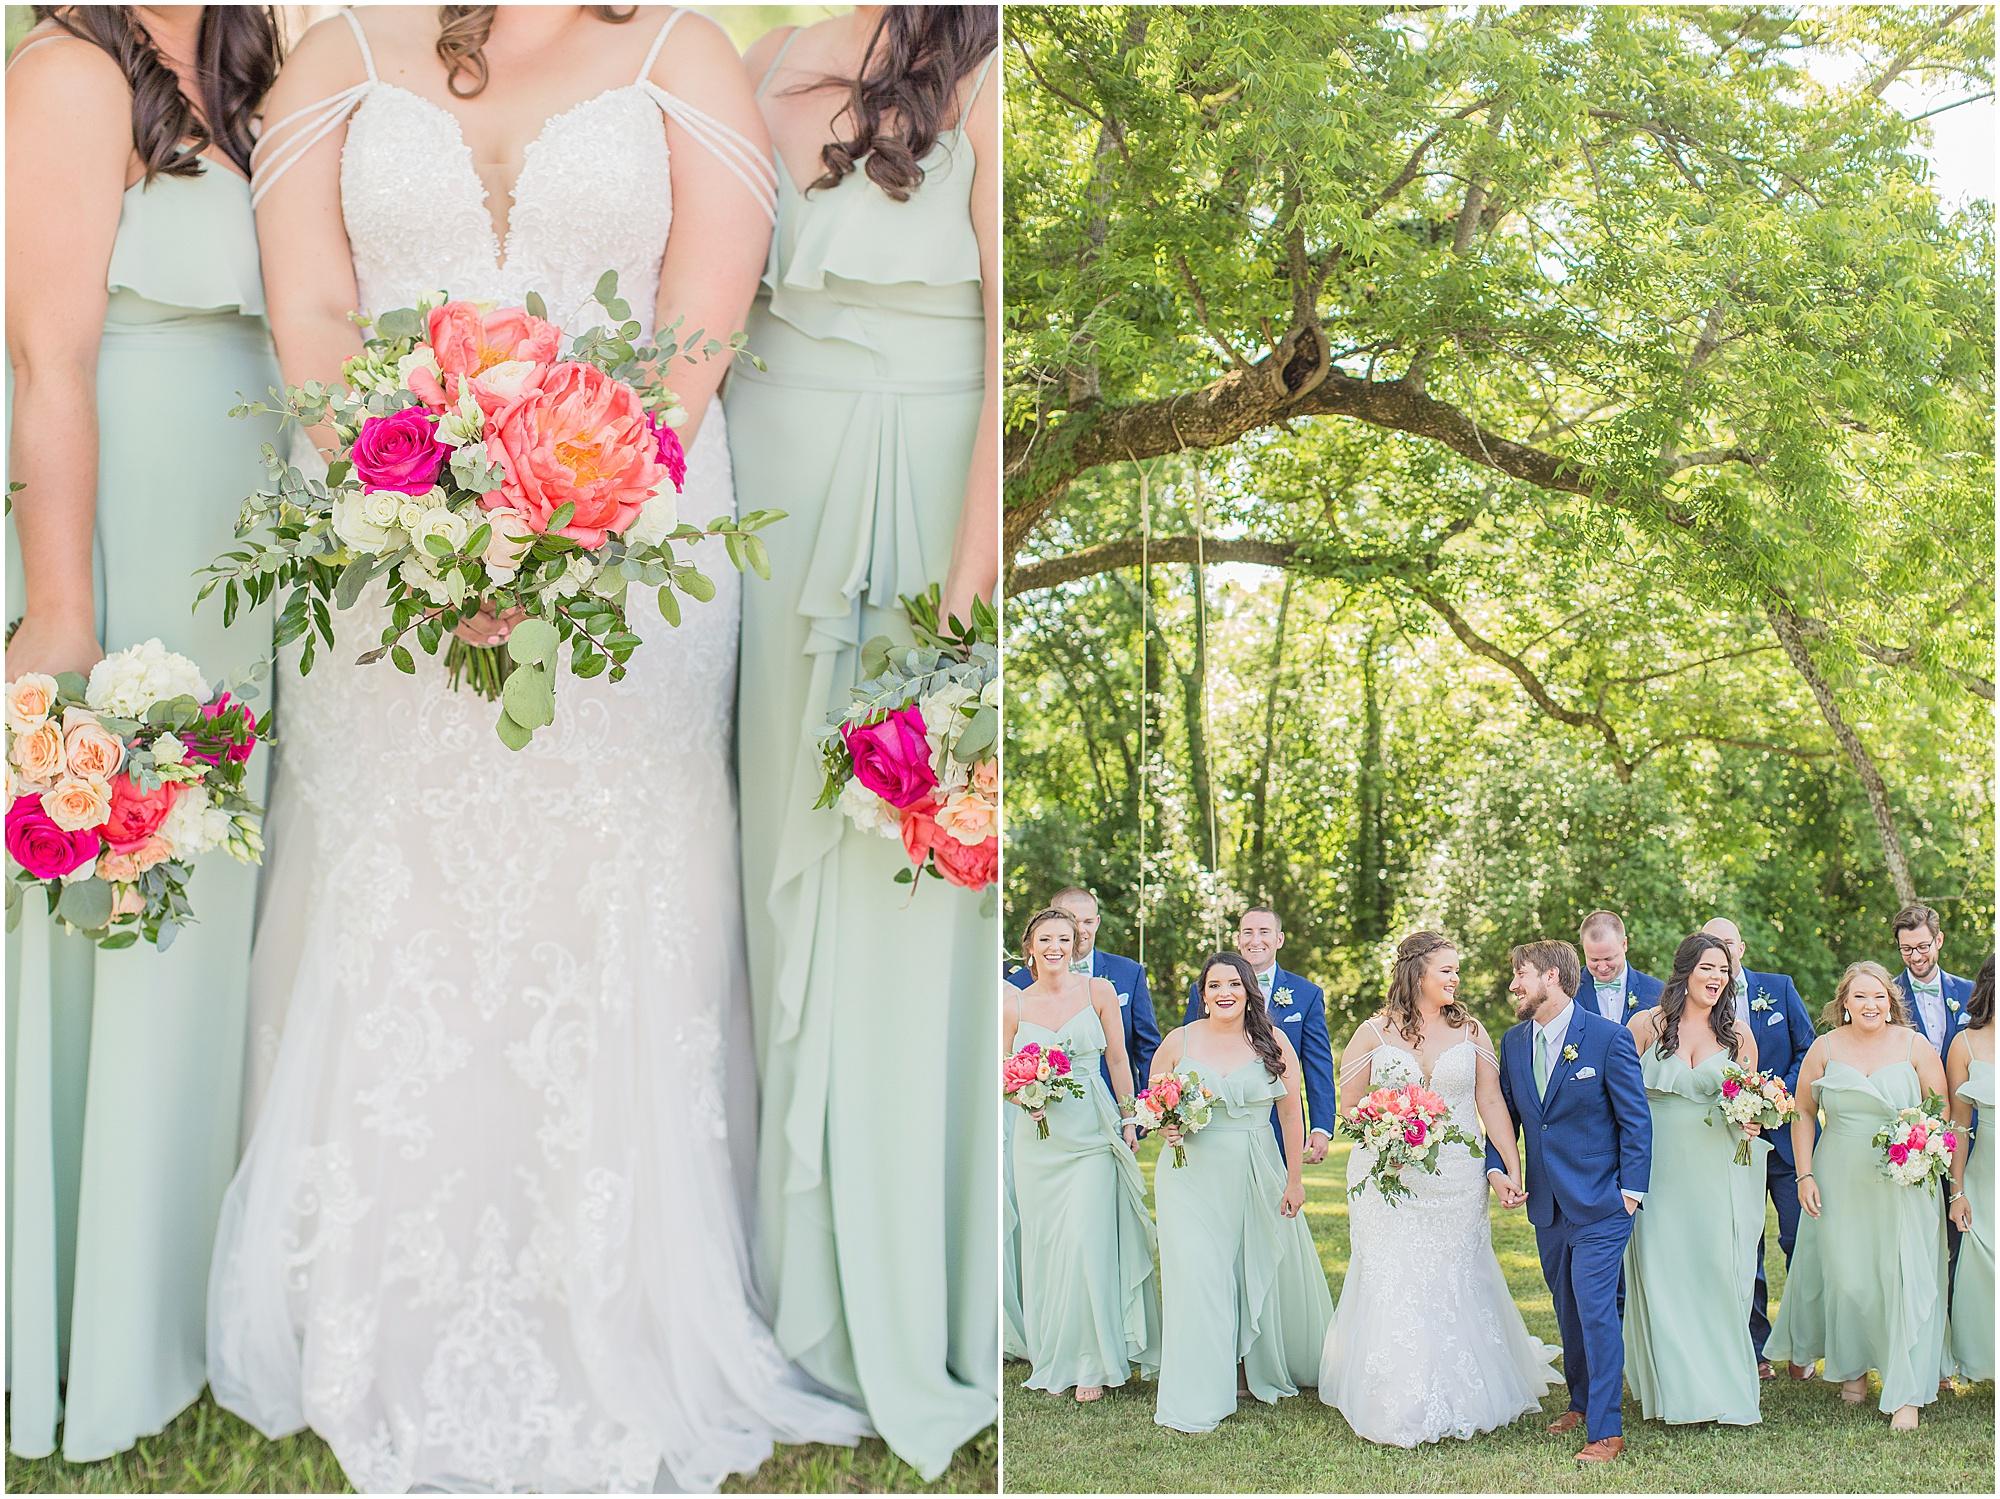 starkville-mississippi-wedding-page-place-dodson-farms_0045.jpg